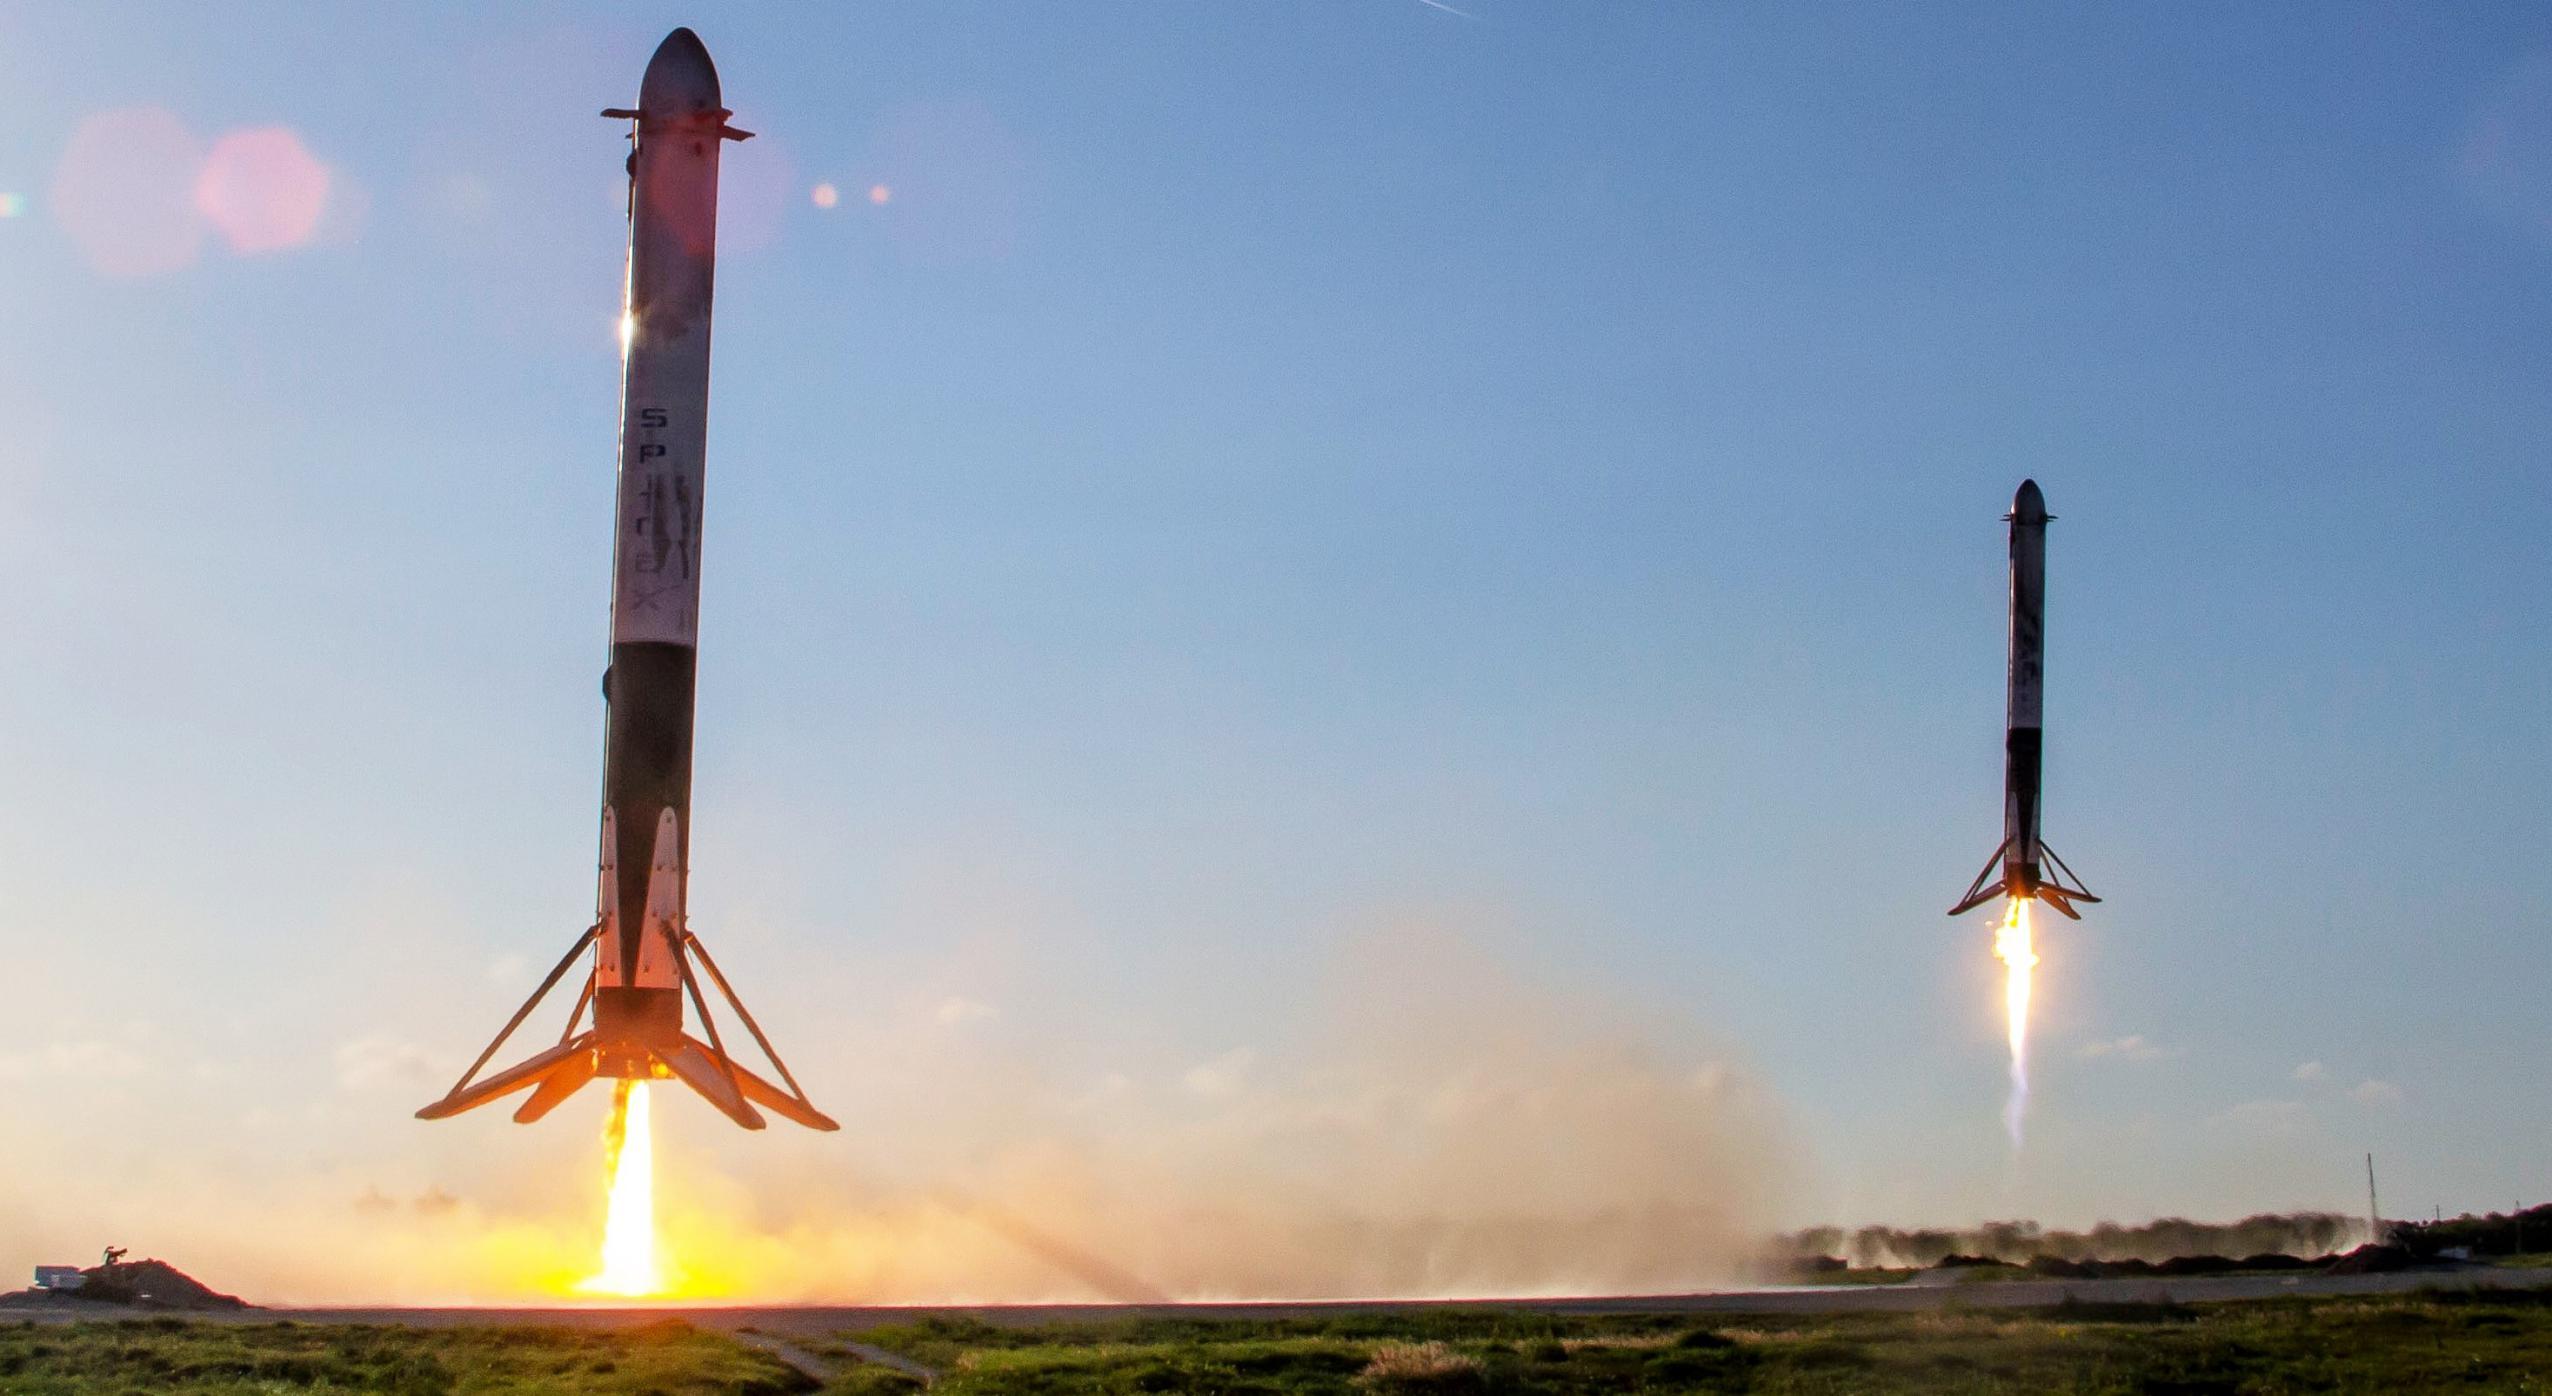 Falcon Heavy B1052 B1053 LZ landing (SpaceX) 1 crop (c)